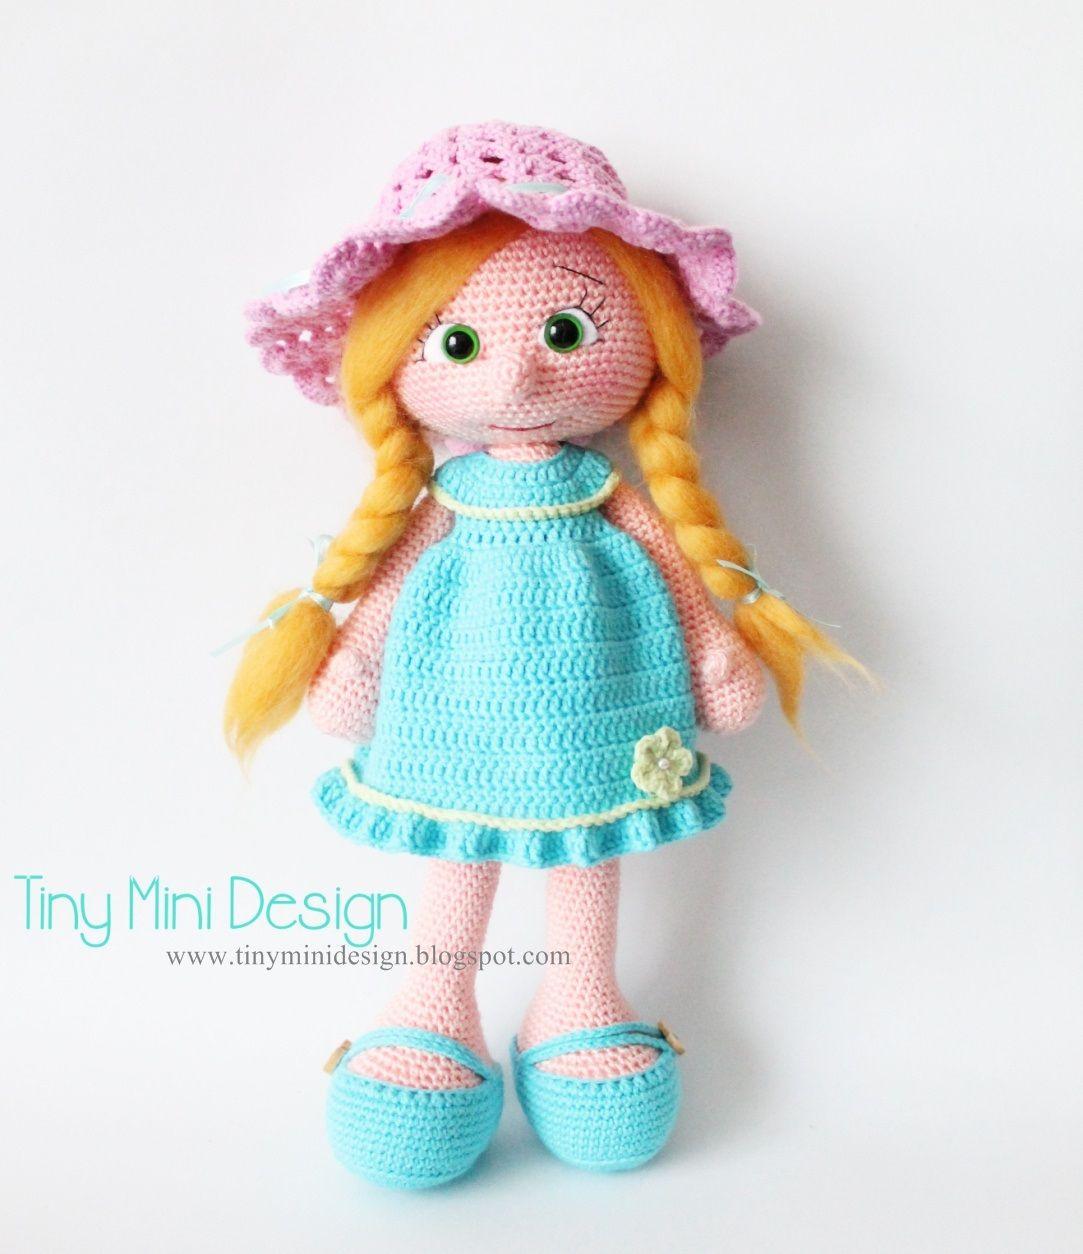 Amigurumi Doll Pattern Cool Design Inspiration